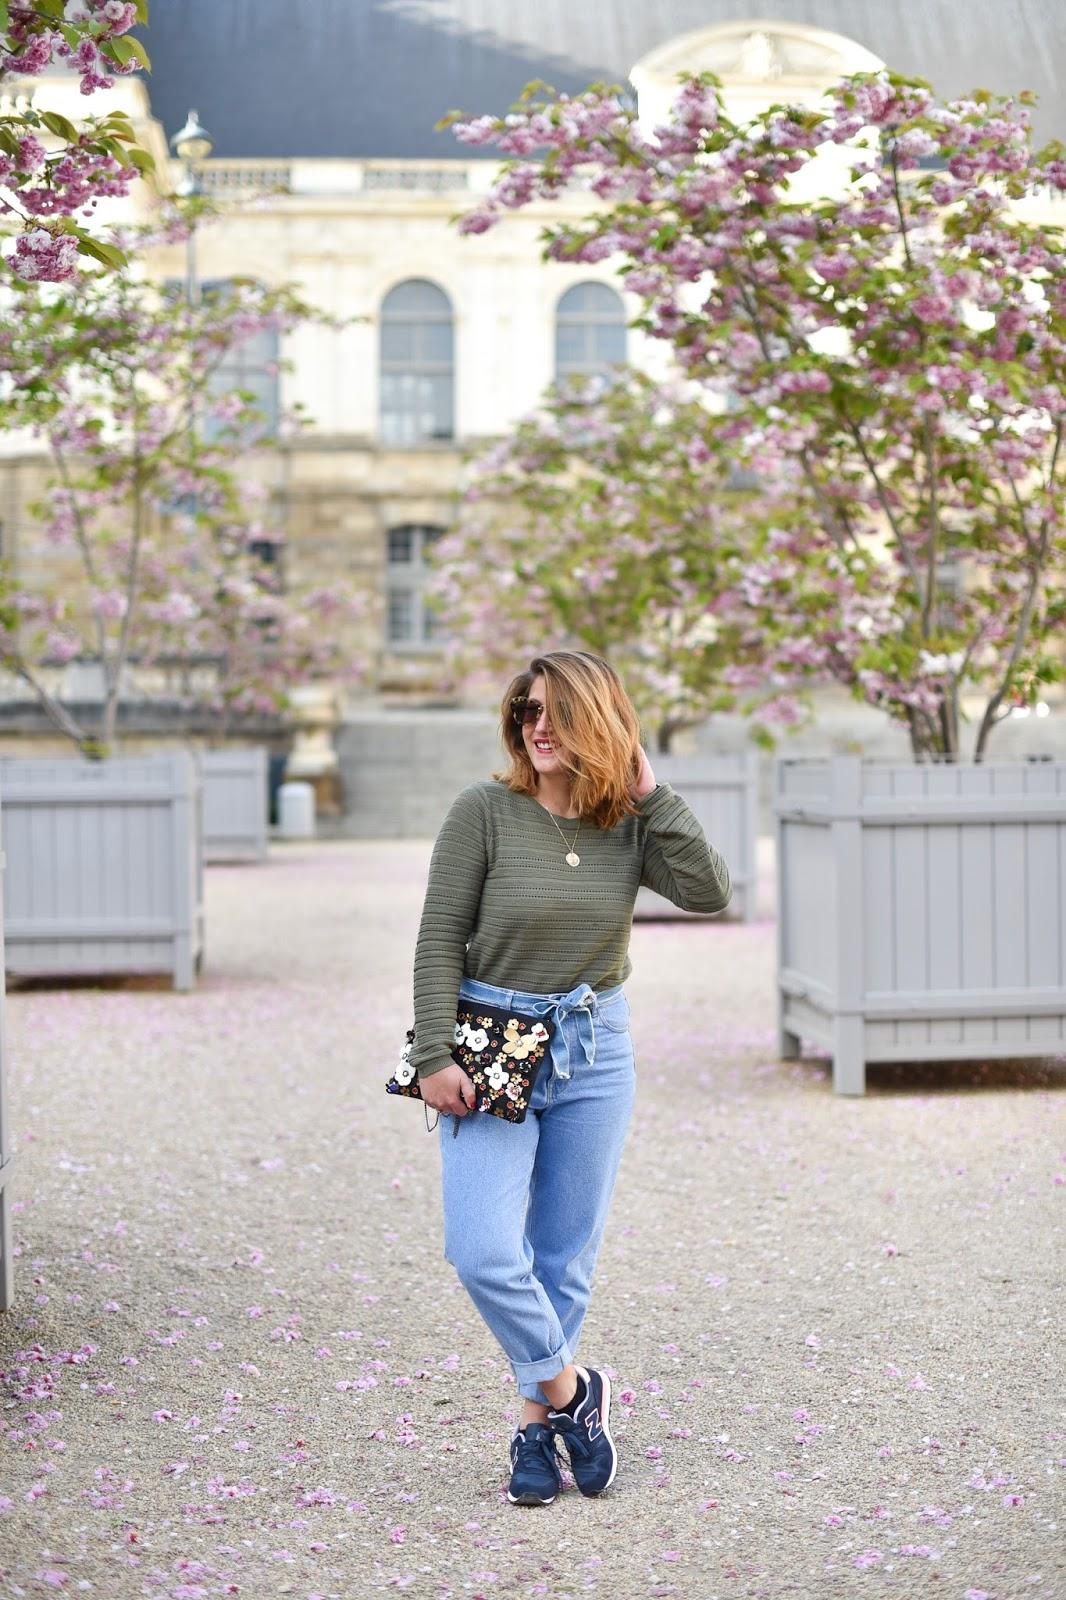 Veste: Mango, Jeans: Zara, Pull: Pimkie, Lunettes: Miu Miu, Pochette: via Boohoo. Baskets: New Balance